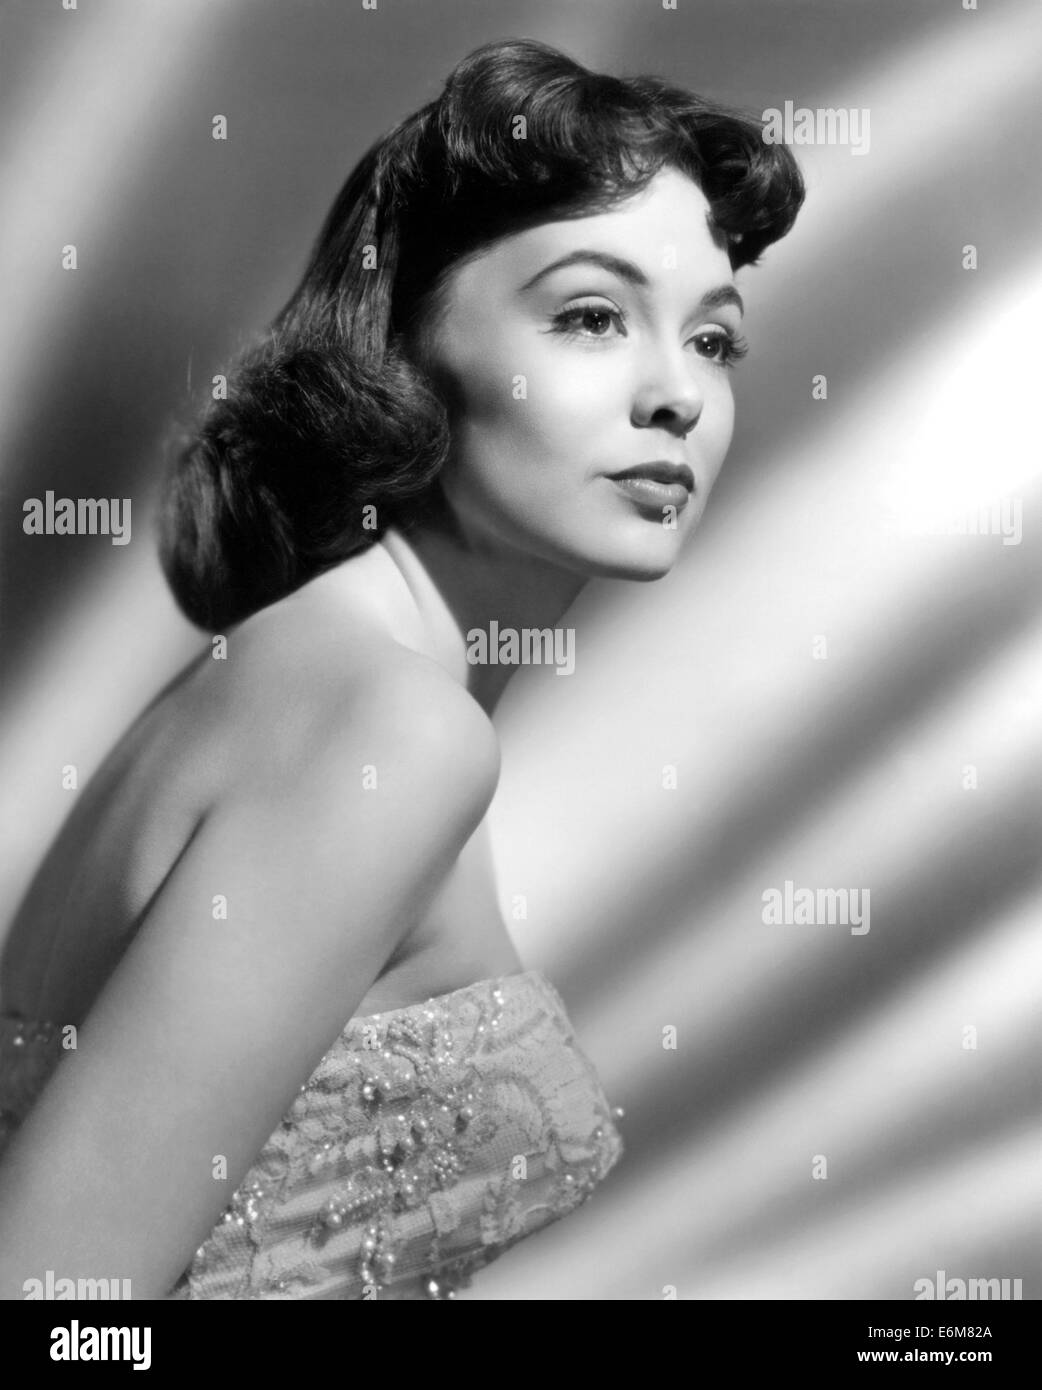 BARBARA RUSH filmes americanos e actriz de TV sobre 1950 Imagens de Stock